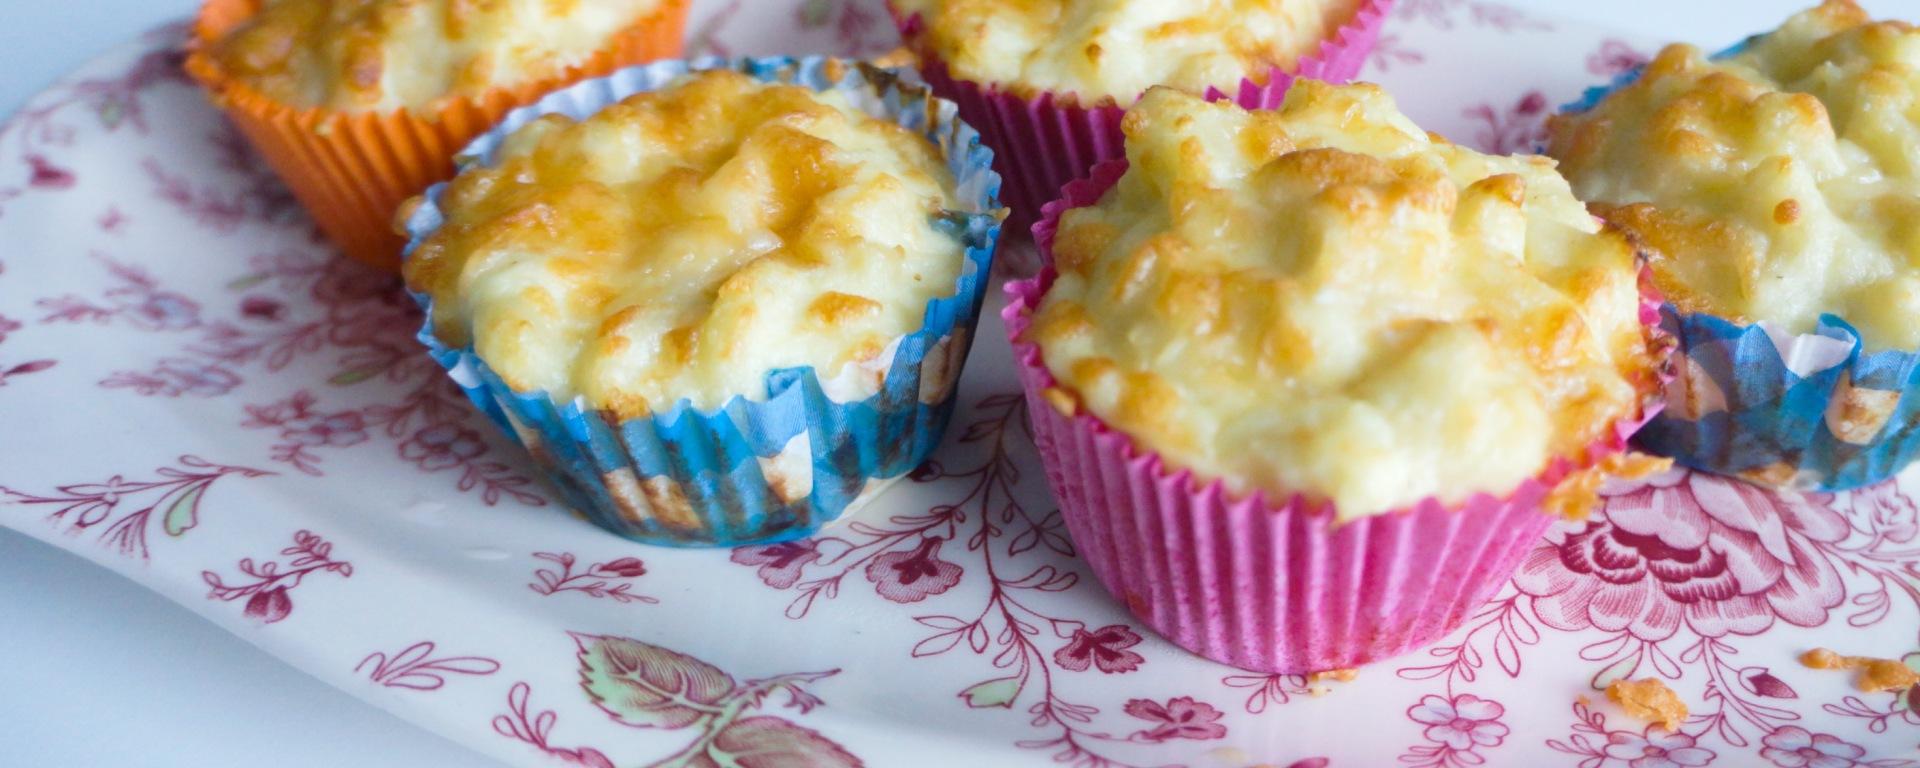 hartige muffins op schaal